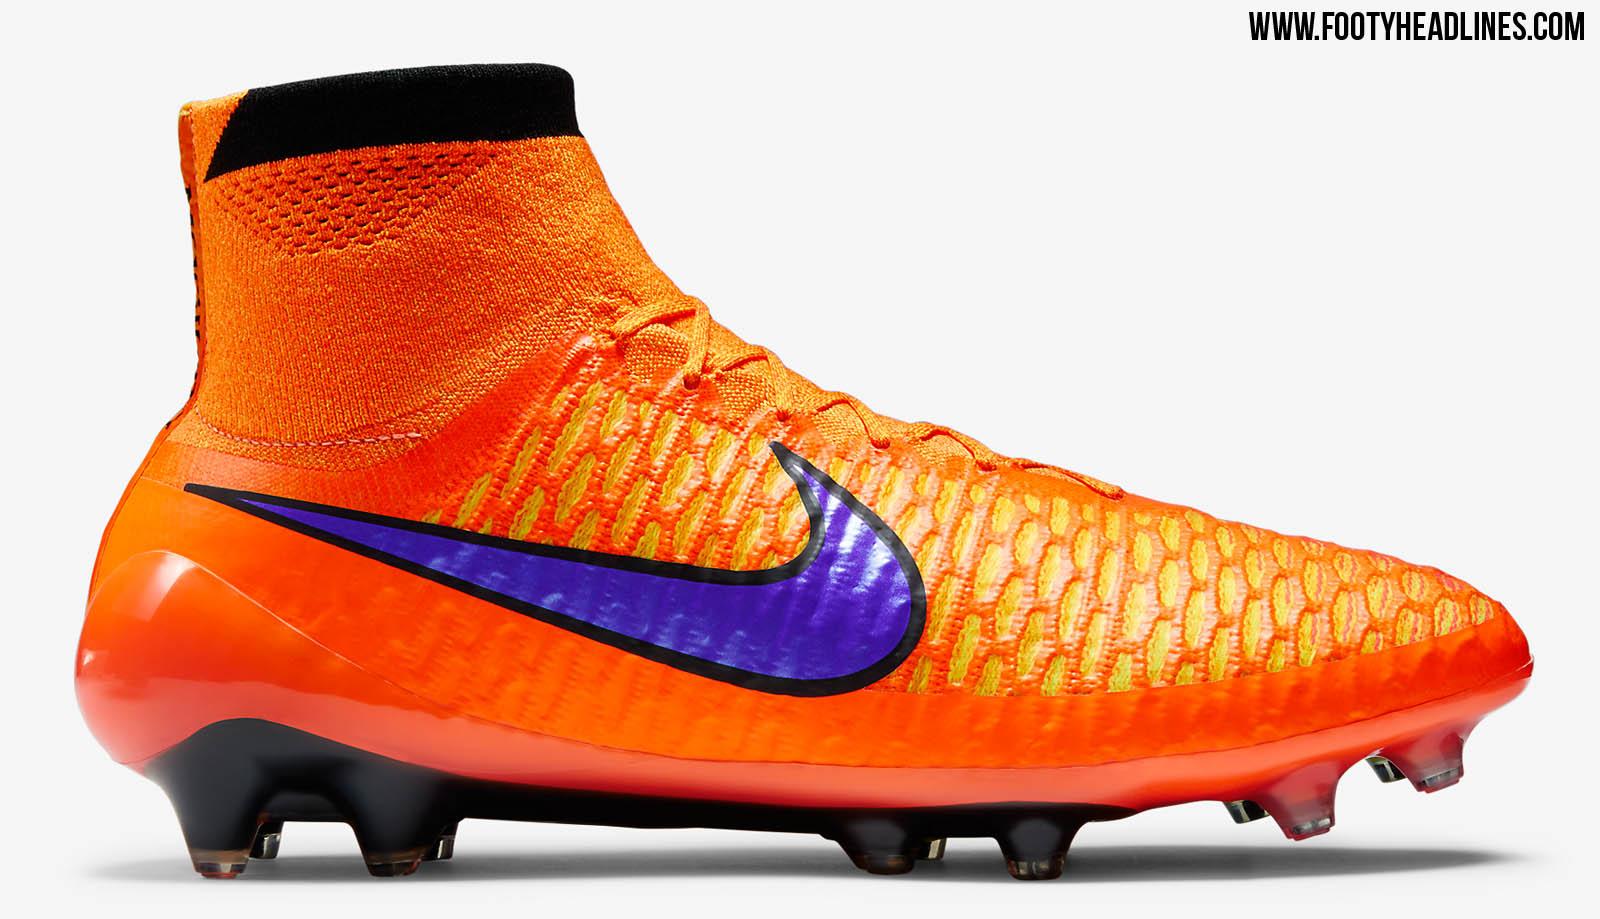 separation shoes ac559 f4779 NIke Magista Orden II FG Fußball Cleats Schuhe 2017 Volt Orange Schwarz  Rosa Marsafenet.info